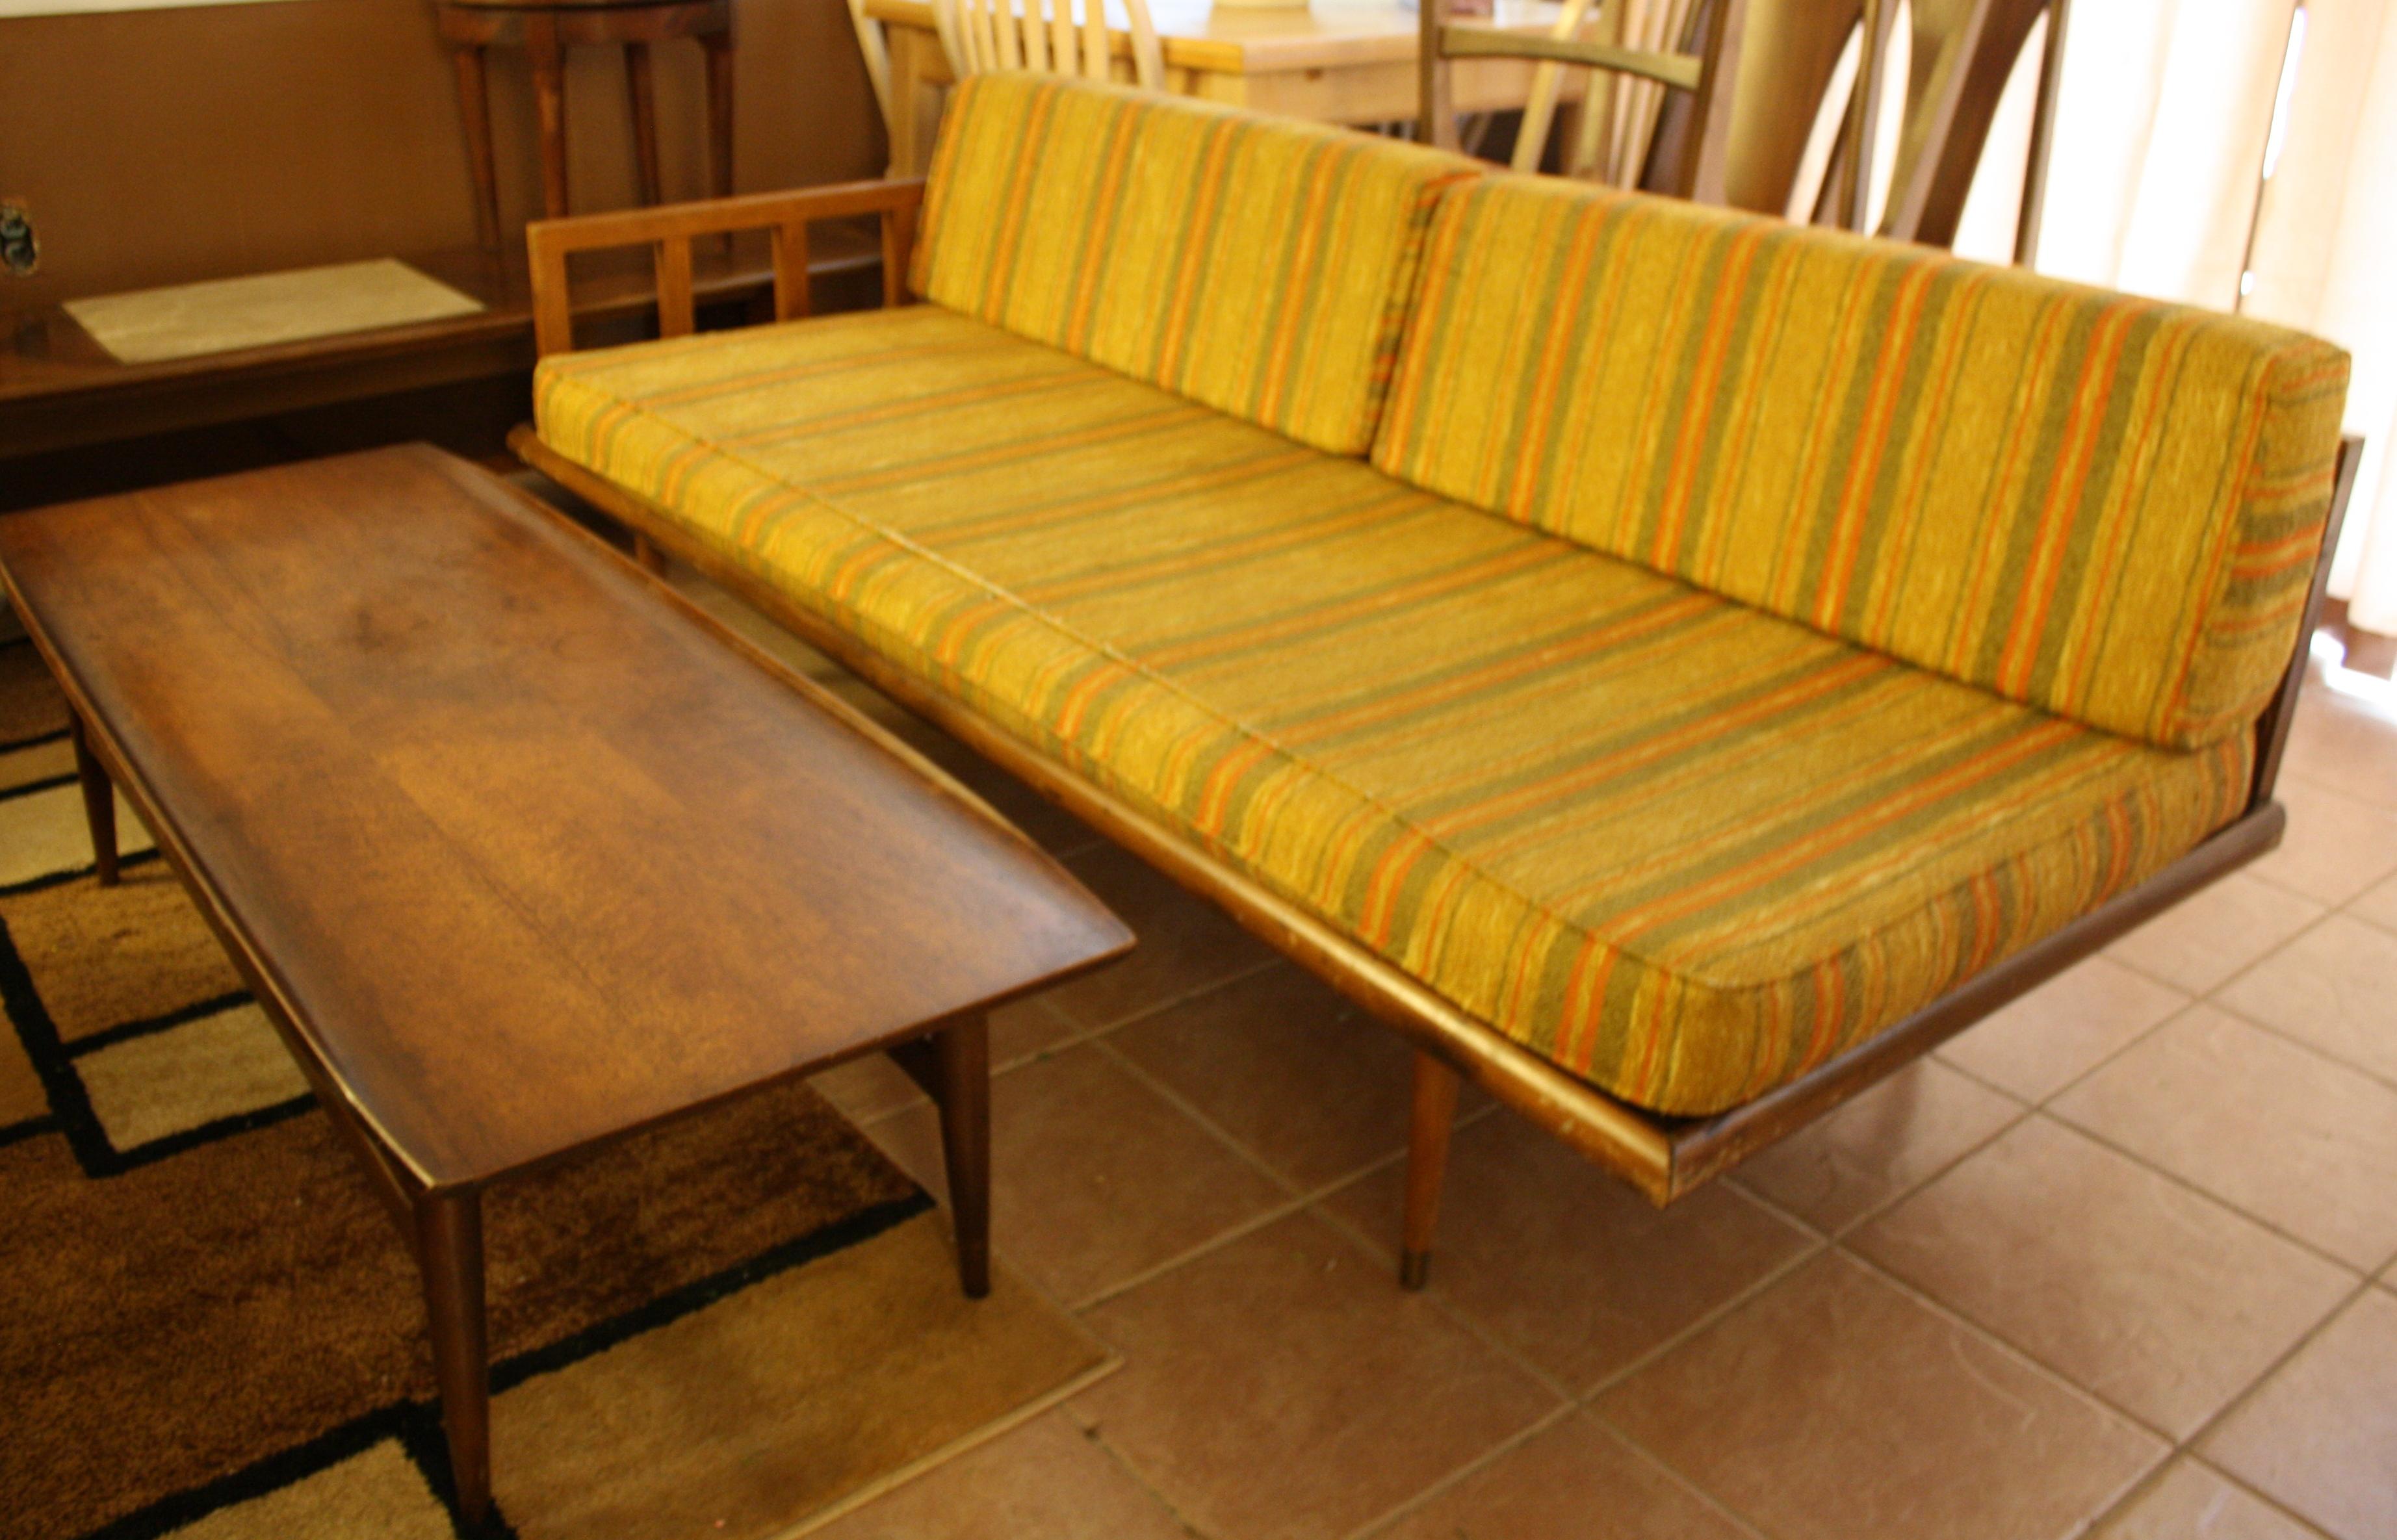 Mid Century Modern Streamlined Sofa with Retro Striped